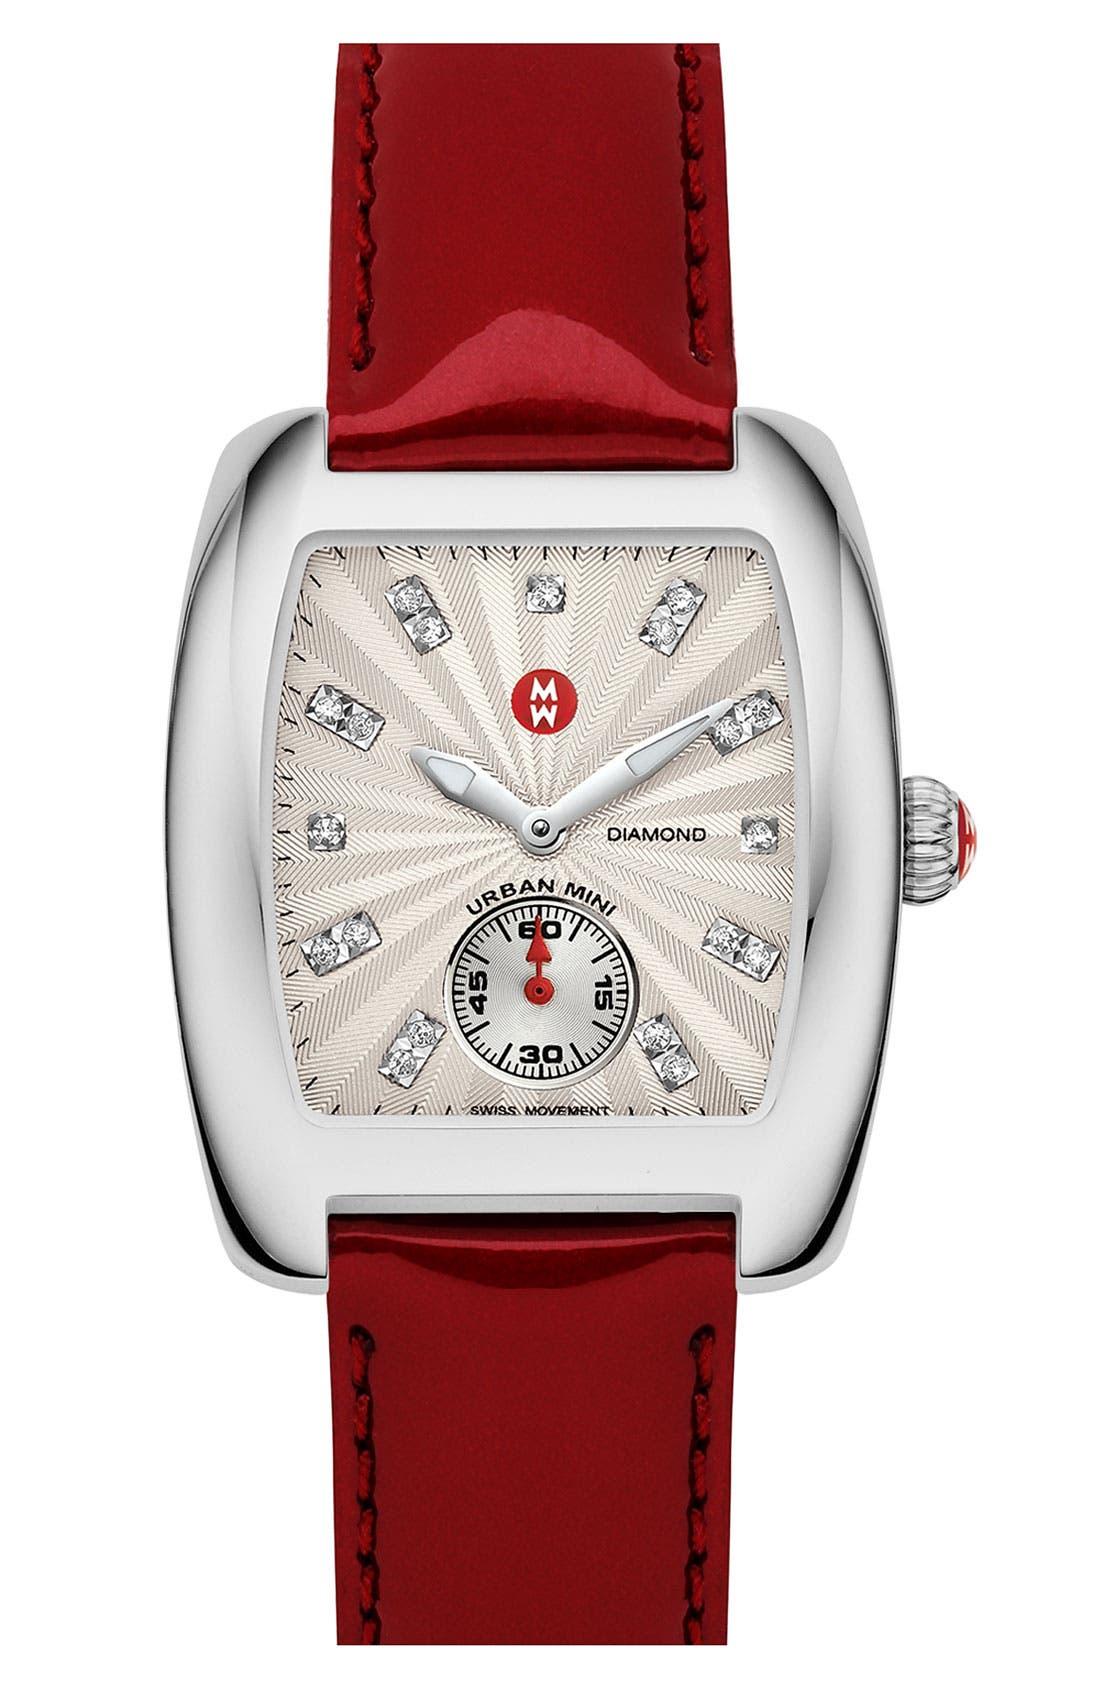 Main Image - MICHELE 'Urban Mini' Diamond Dial Watch Case & 16mm Scarlet Patent Leather Strap